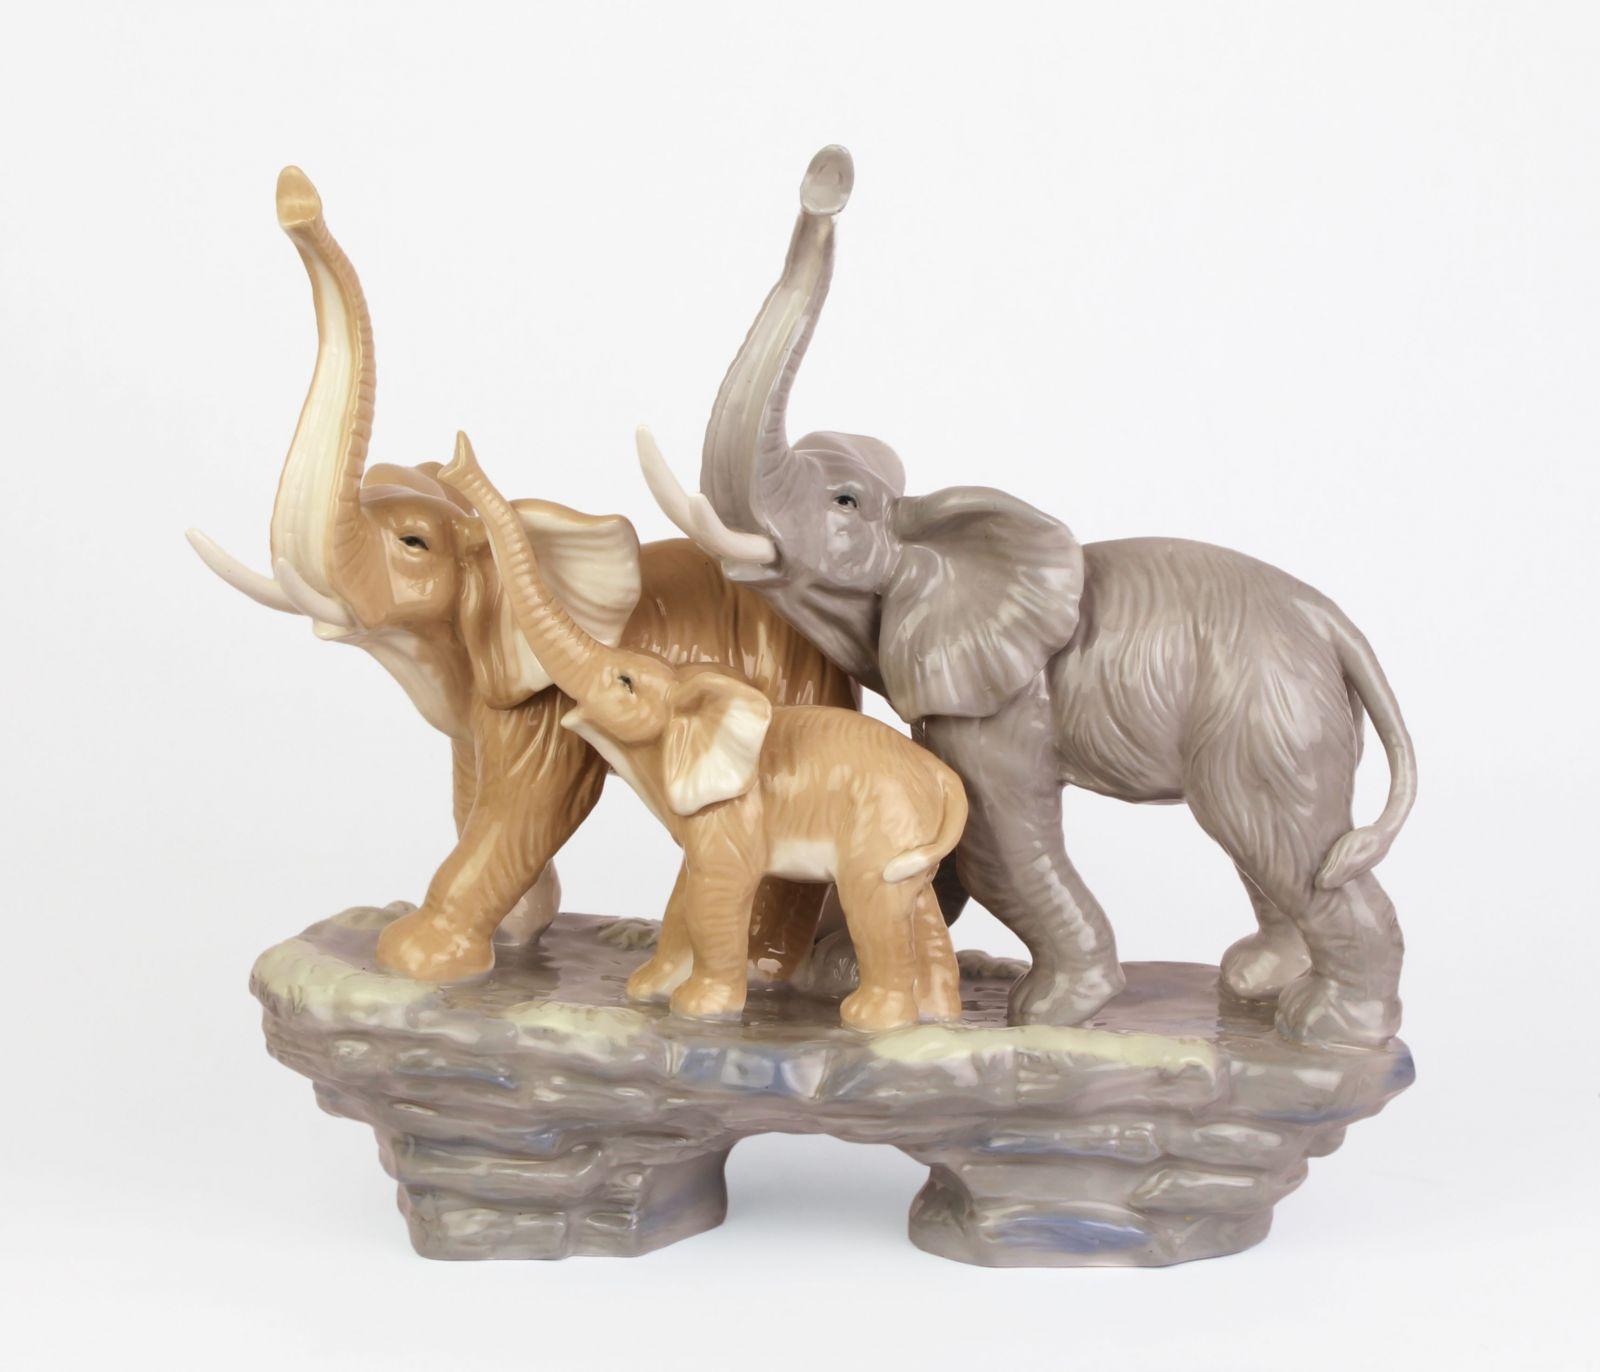 A PORCELAIN GROUP OF AN ELEPHANT FAMILY